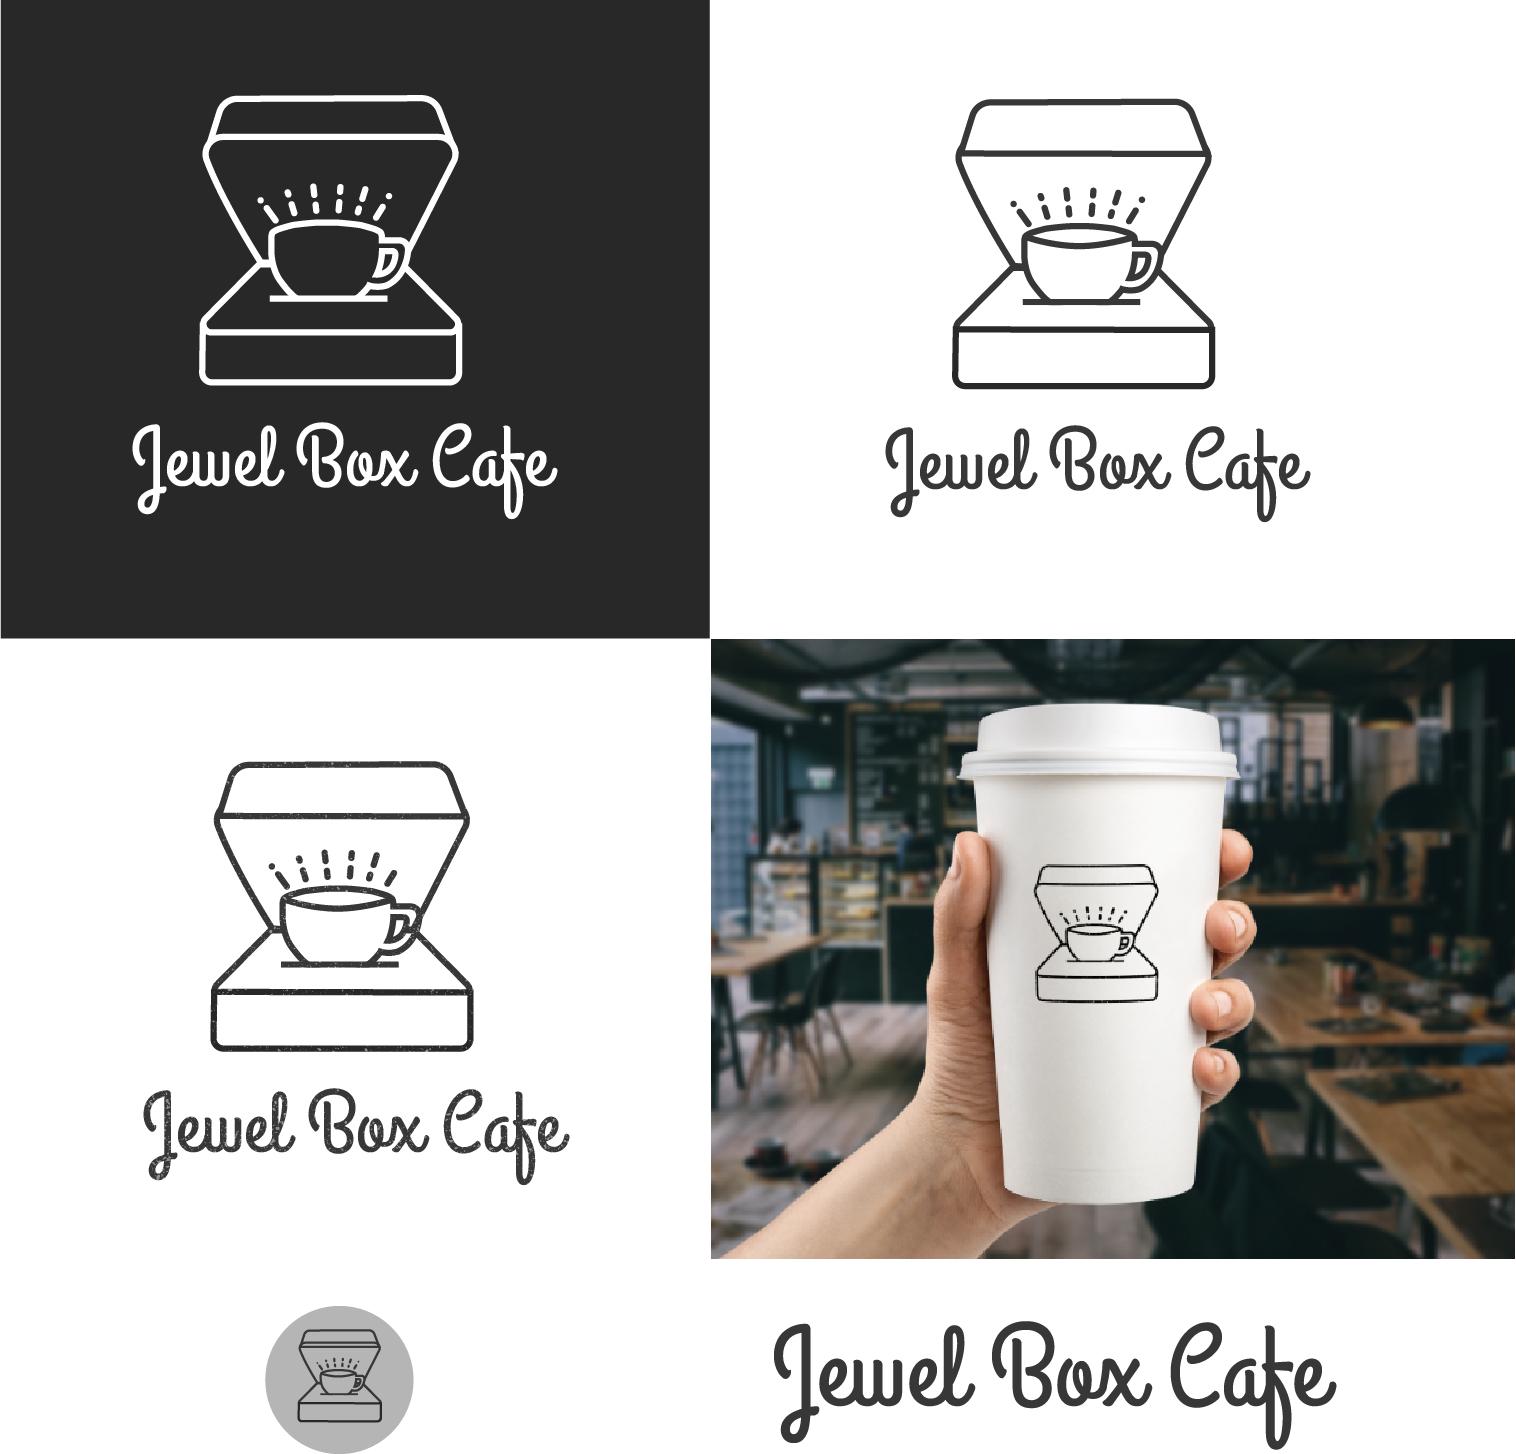 Direction_A_v2_Jewel_Box_Cafe.jpg